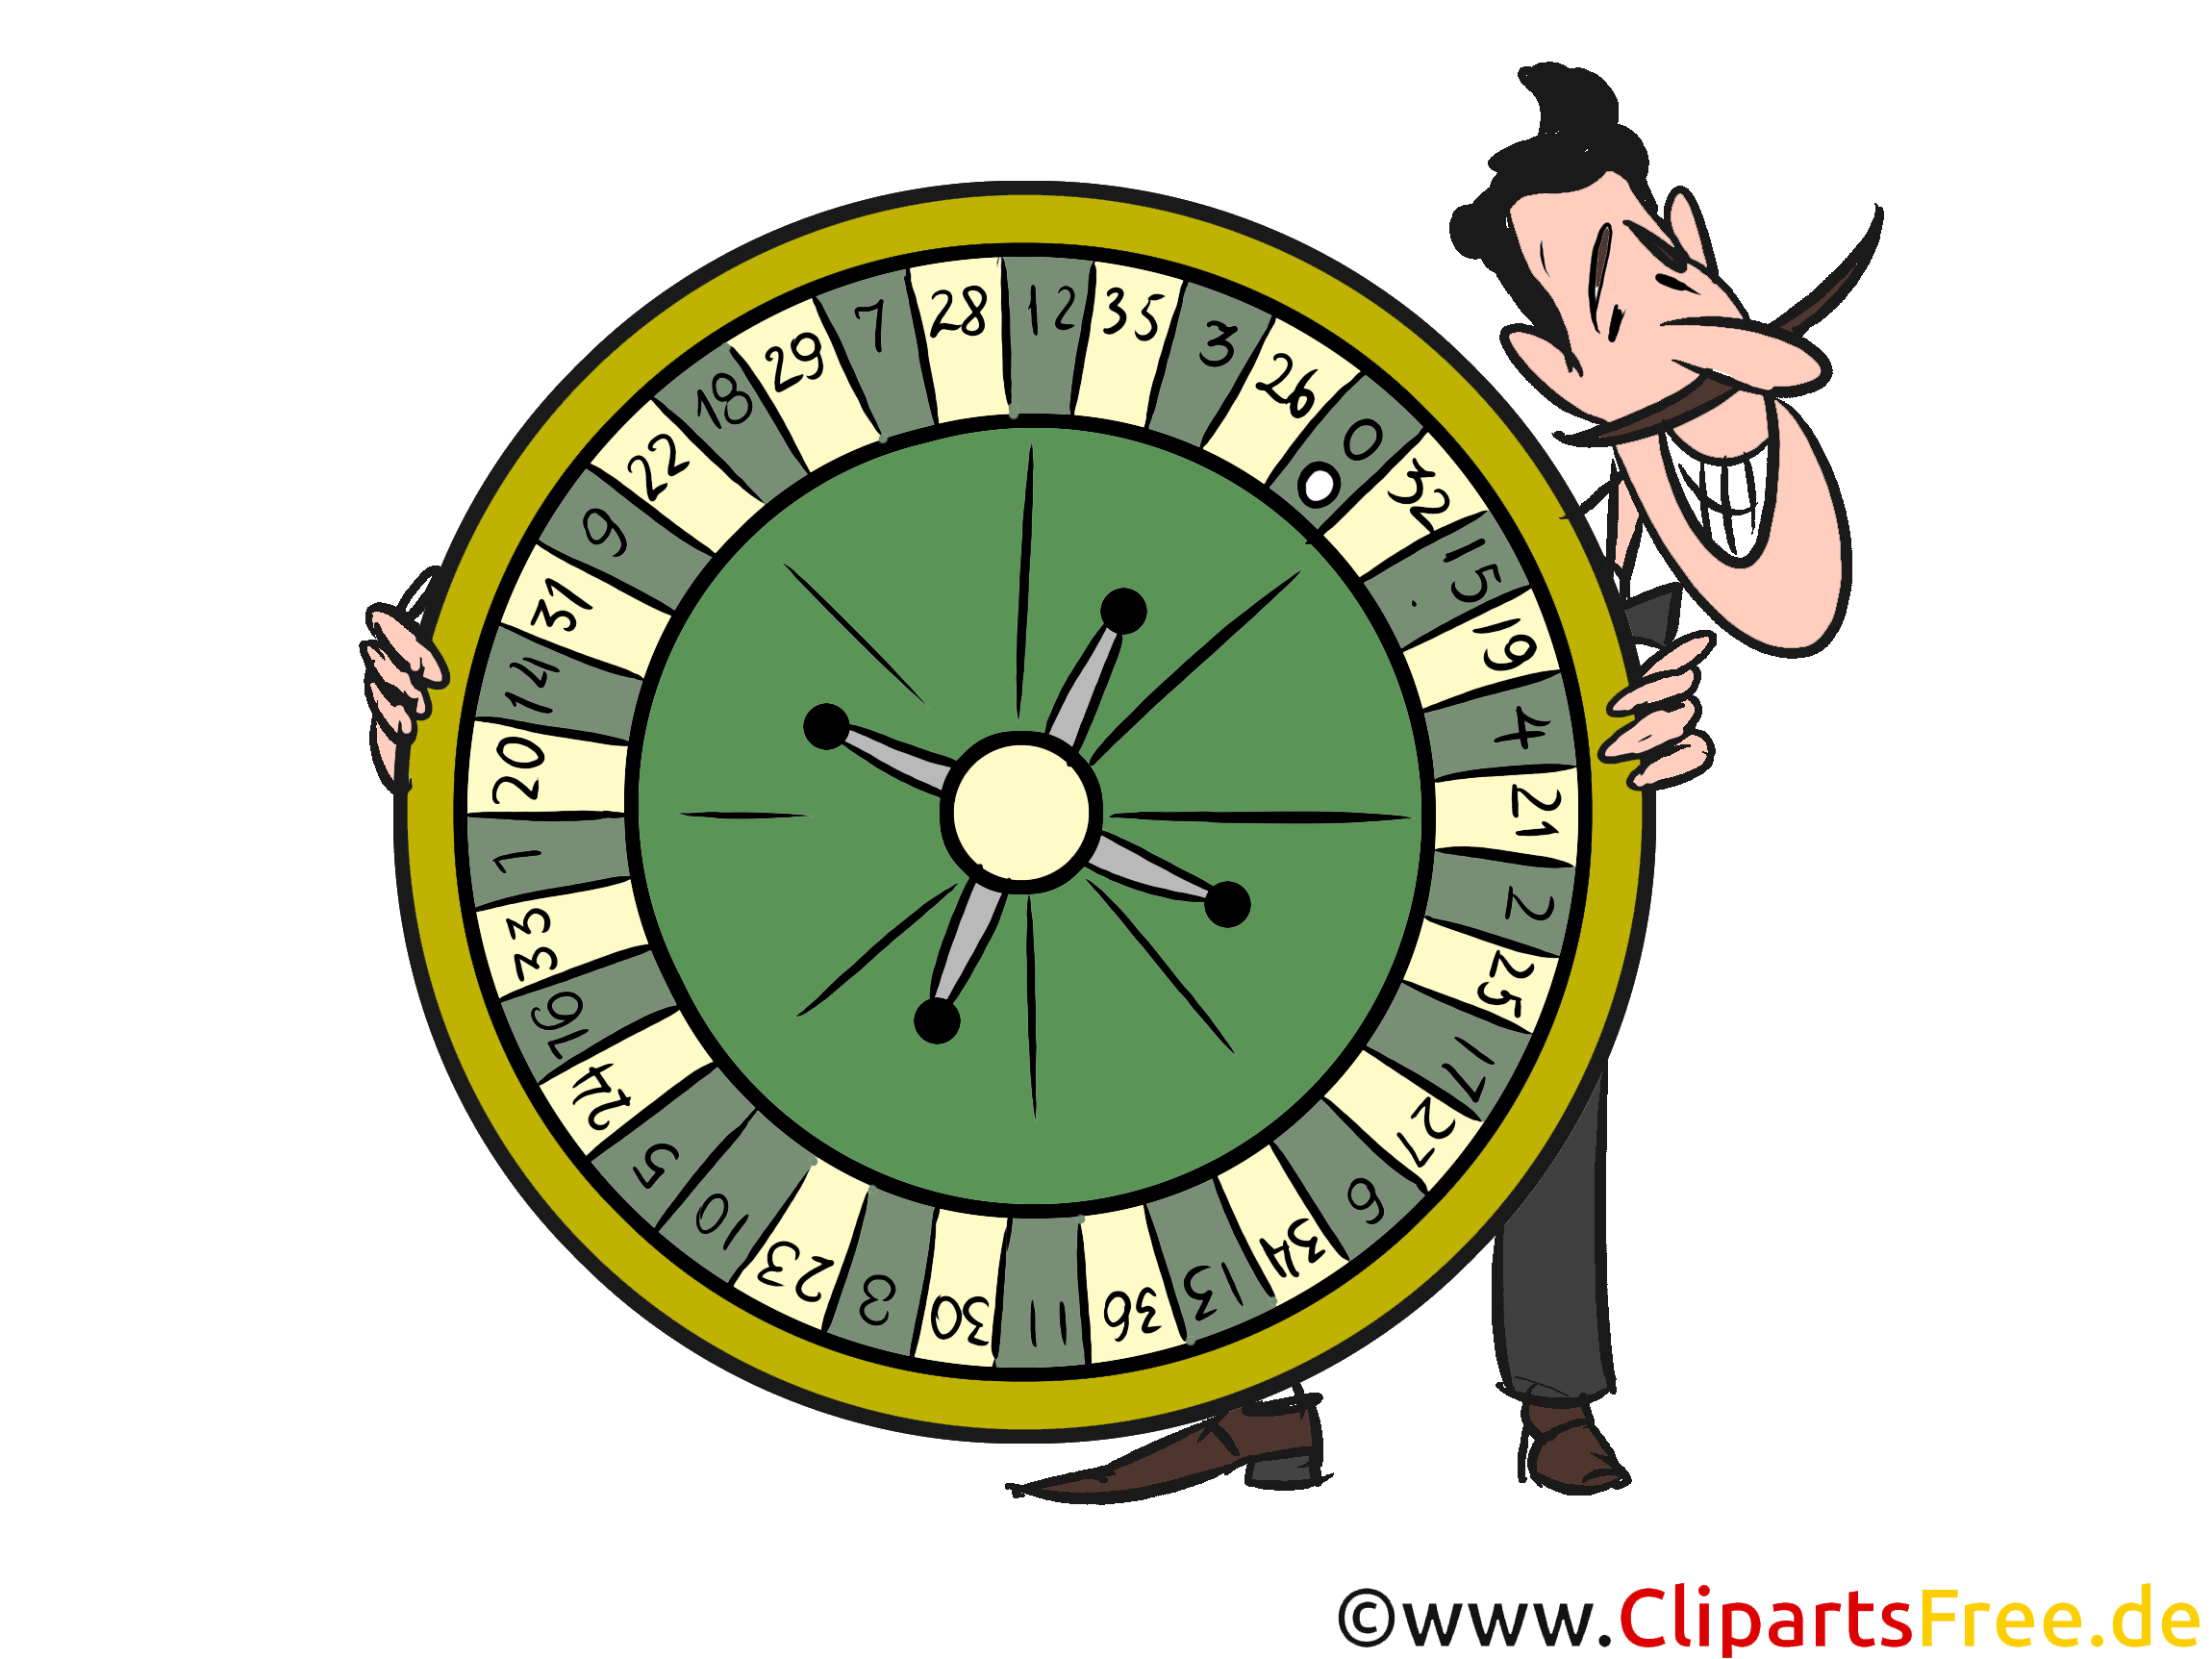 Roulette Wheel Illustration, Clipart, Image